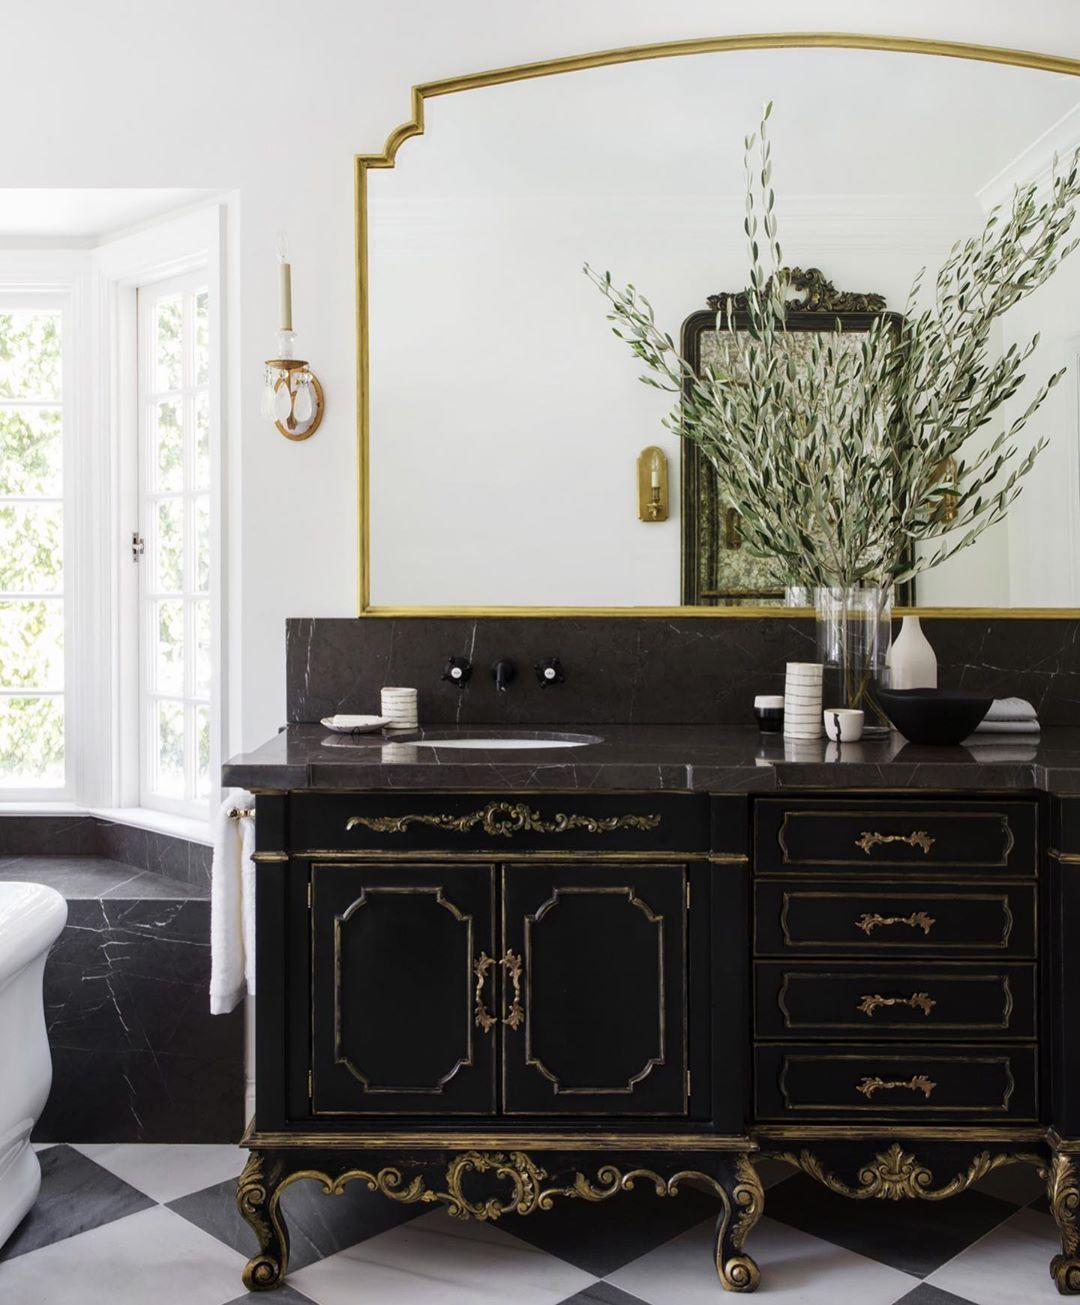 15 Gorgeous Diy Bathroom Vanity Ideas